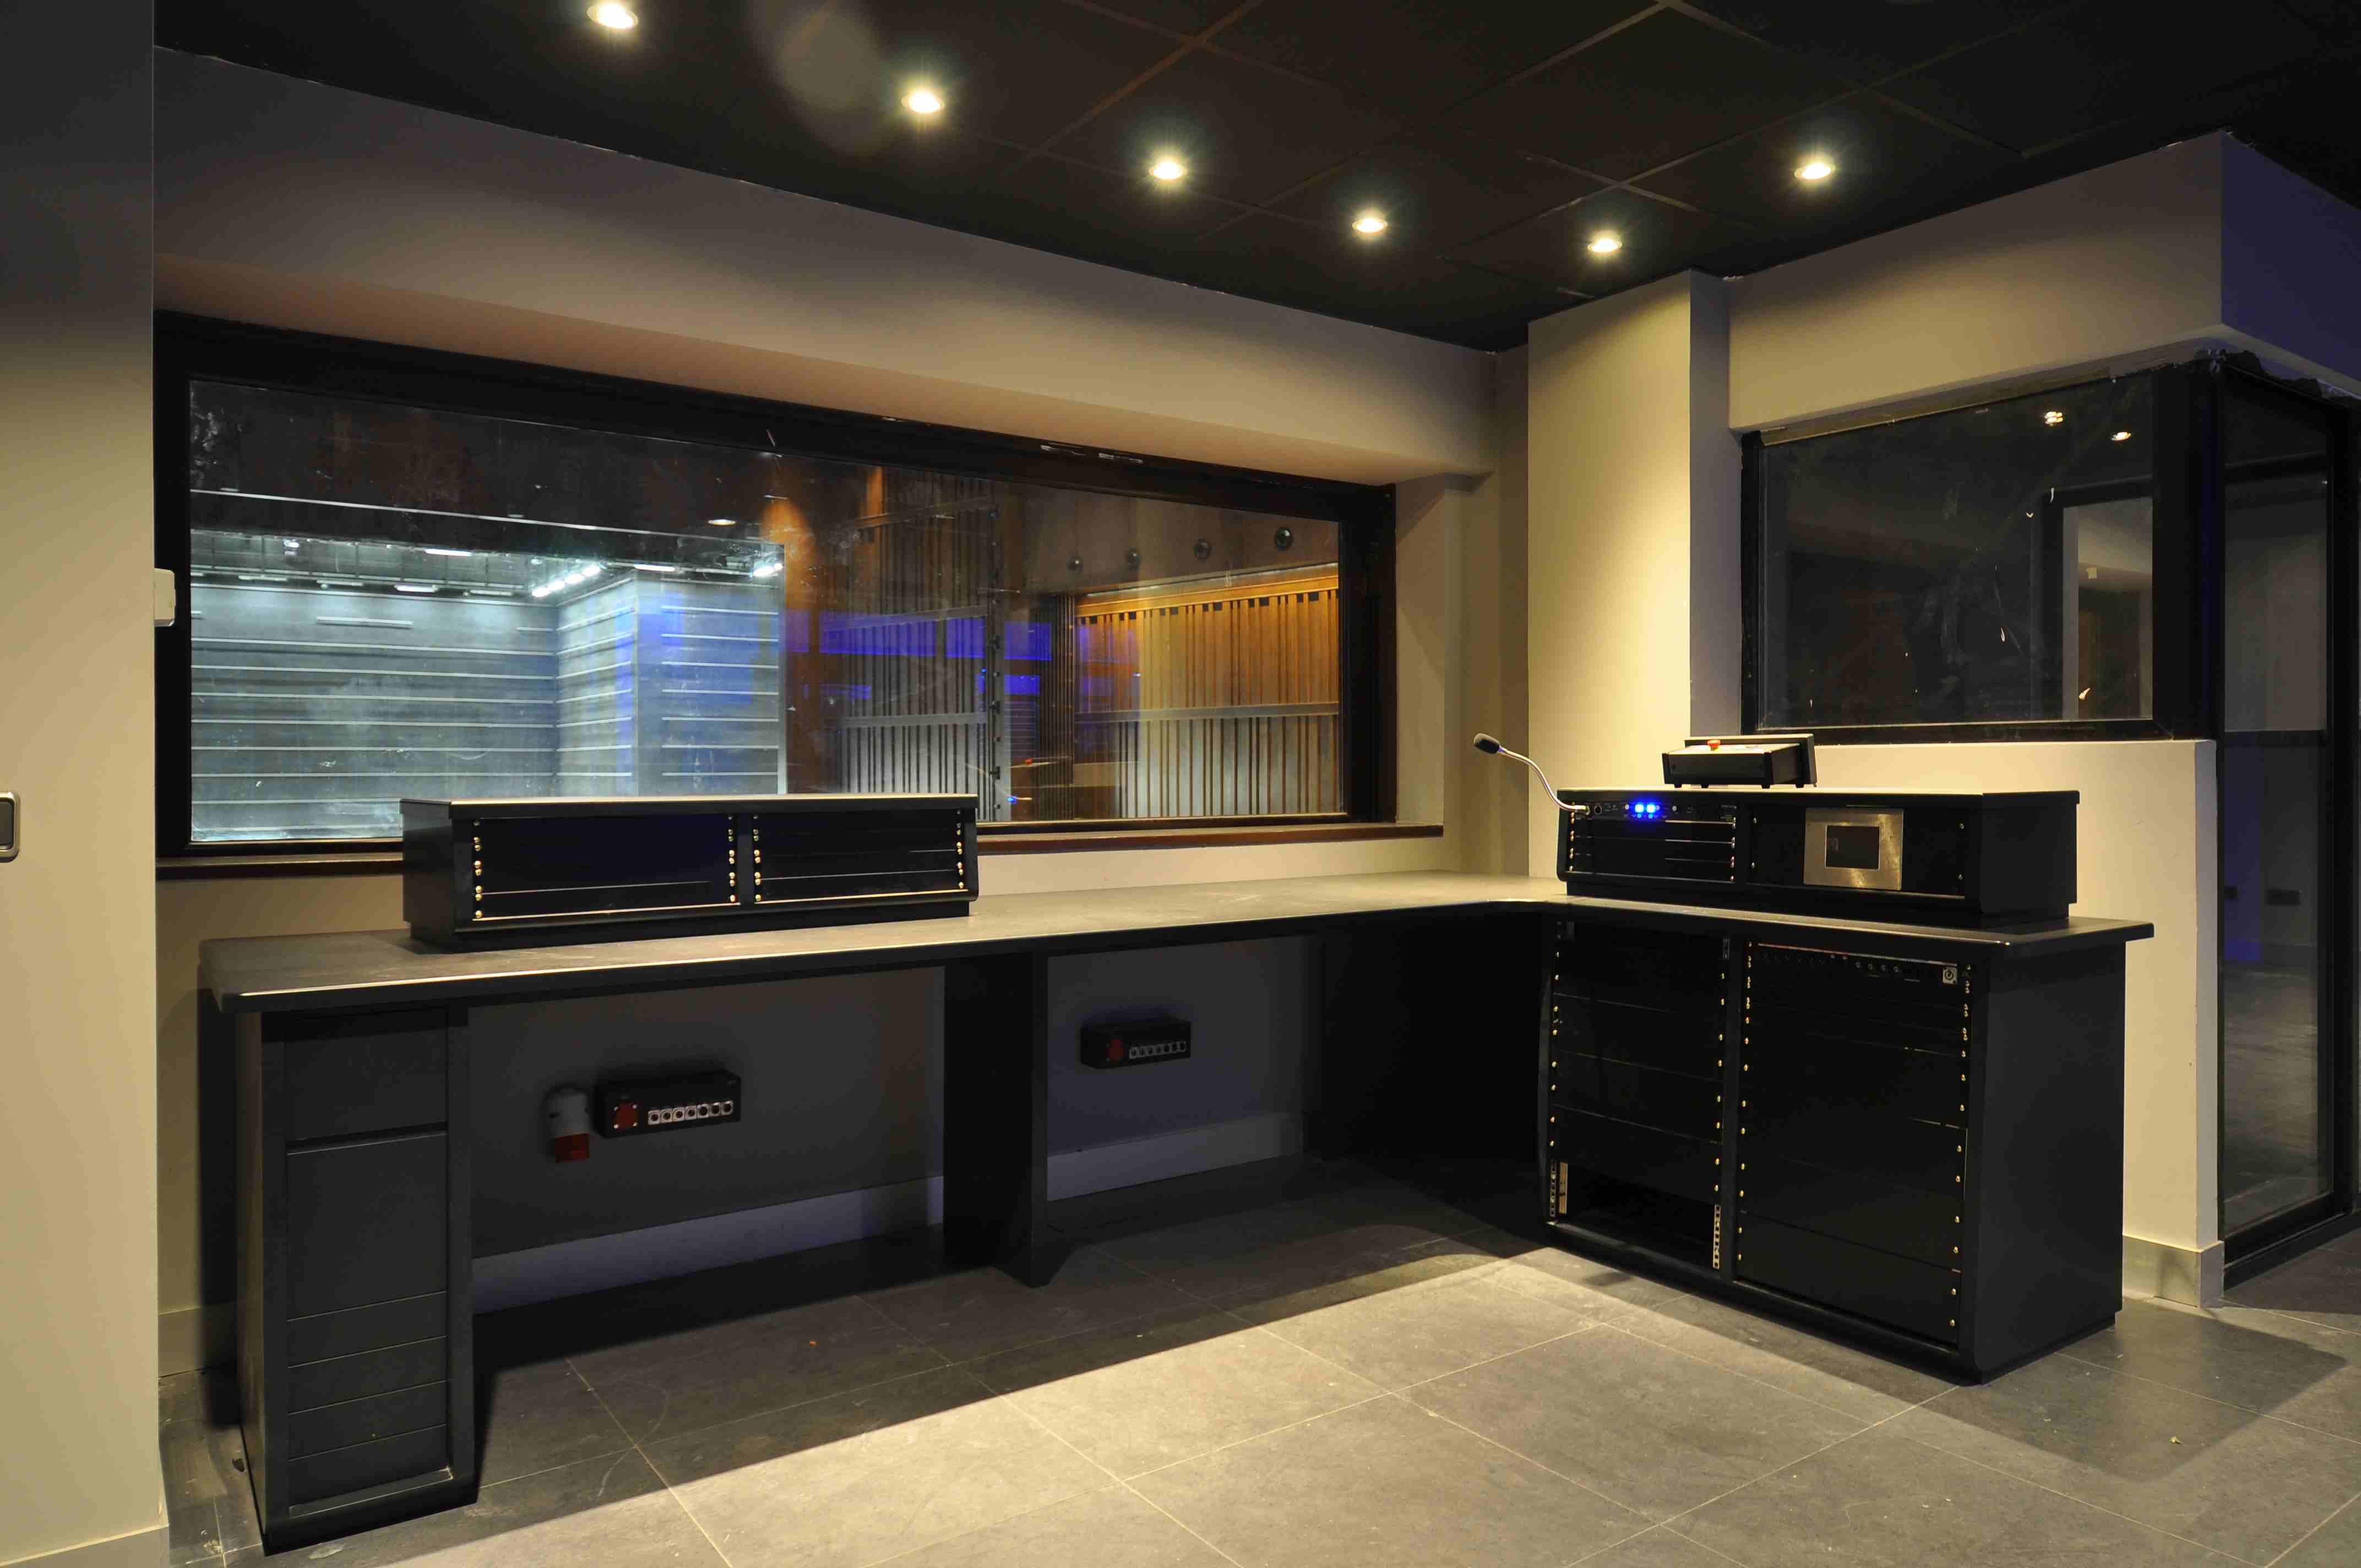 007 Control Central Mueble Iluminación.JPG